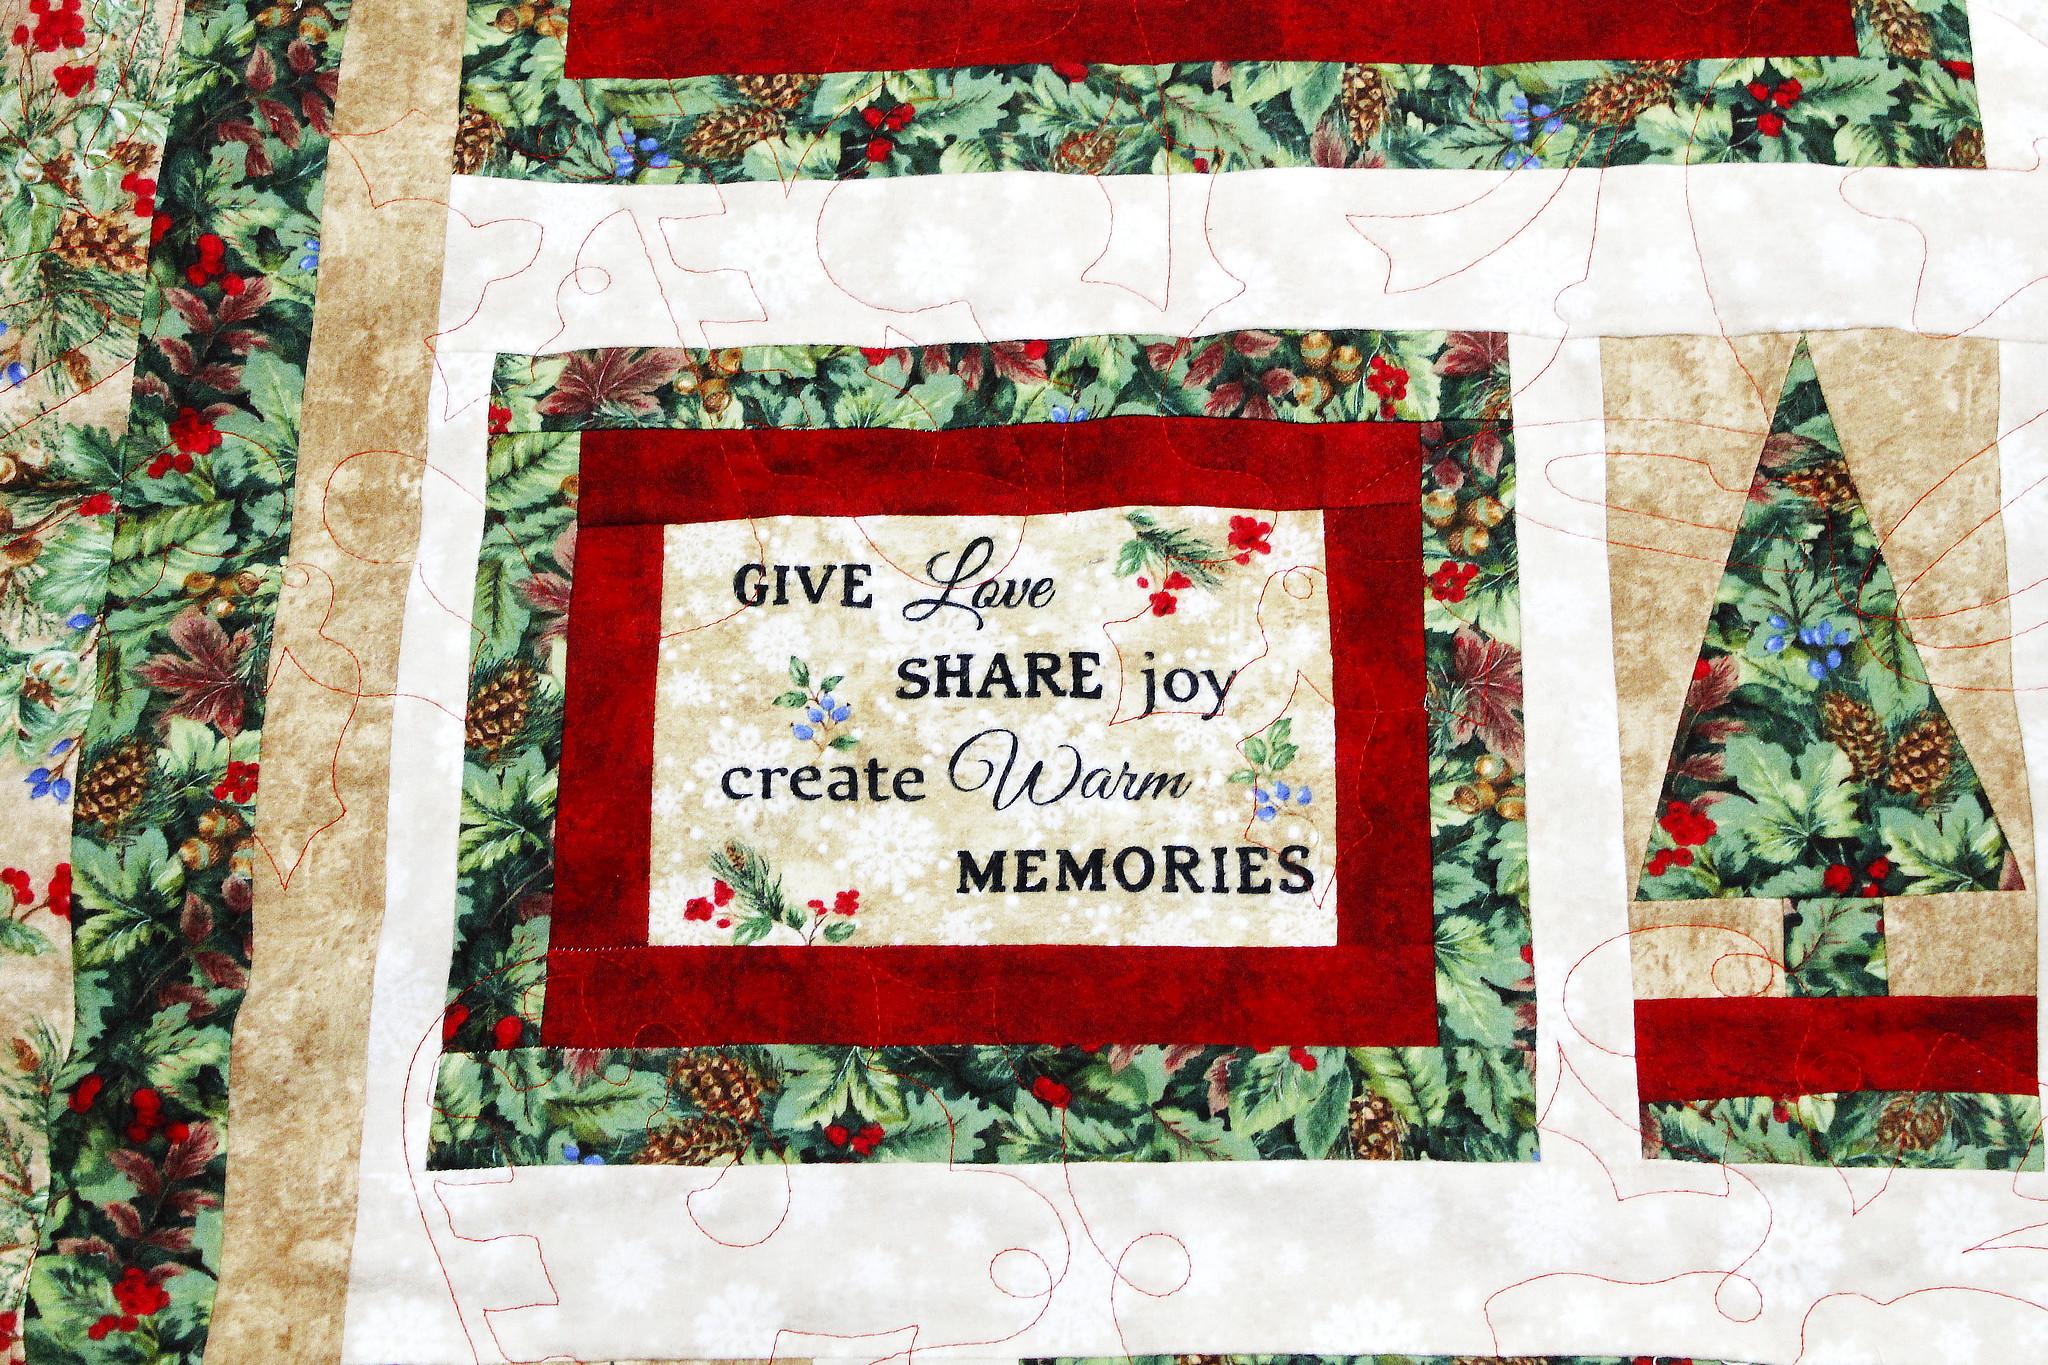 Ann's Christmas Card Quilt